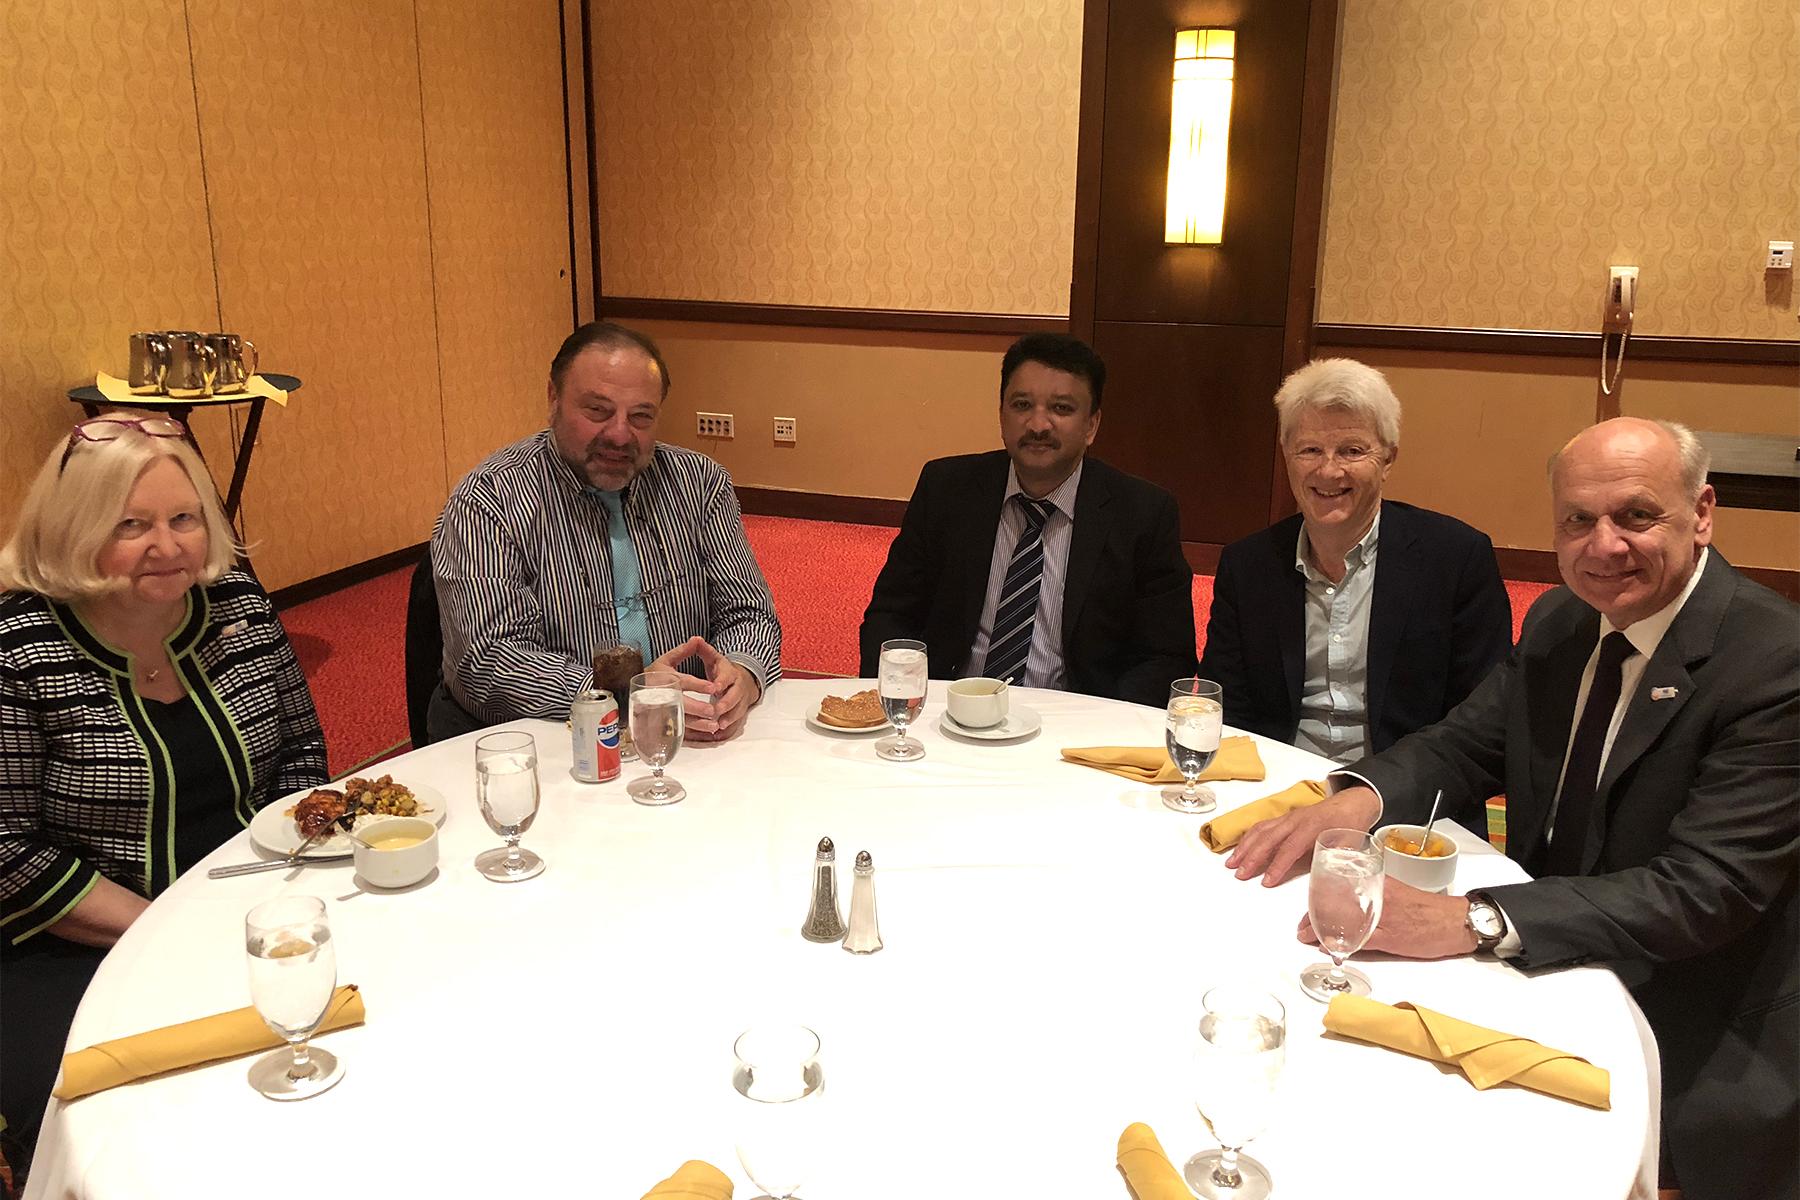 Dr Sm Balaji At A Luncheon Meet With Dr Kathryn Kell, President, Fdi, Dr Nikolai Sharkov Council Member